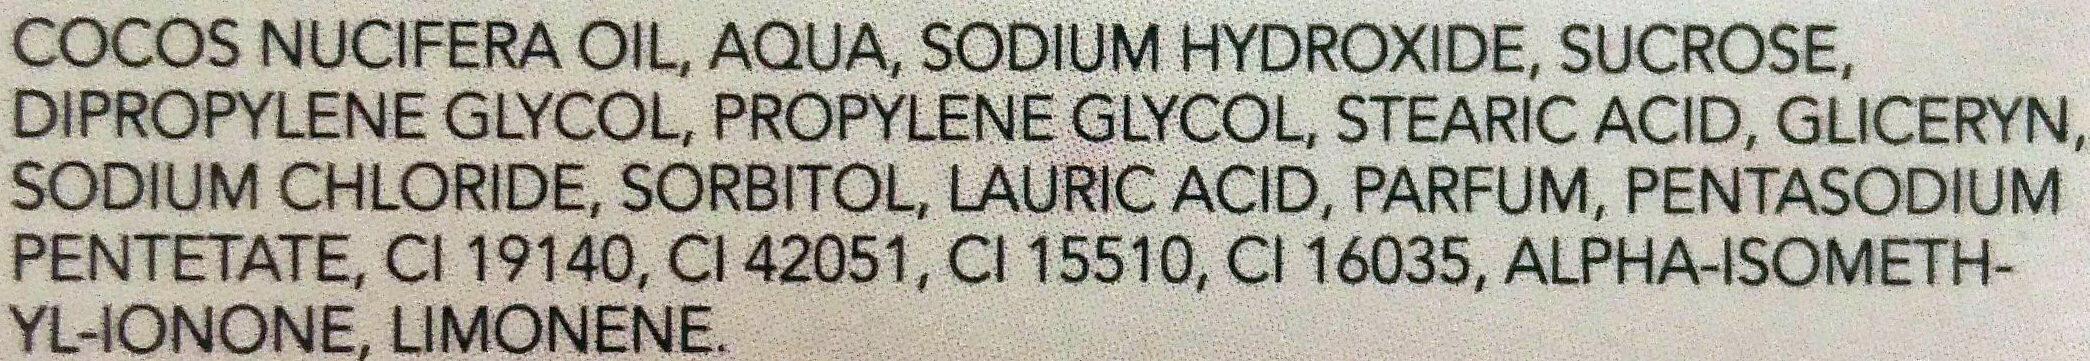 Glicerina Sabonete Mel - Ingredientes - pt